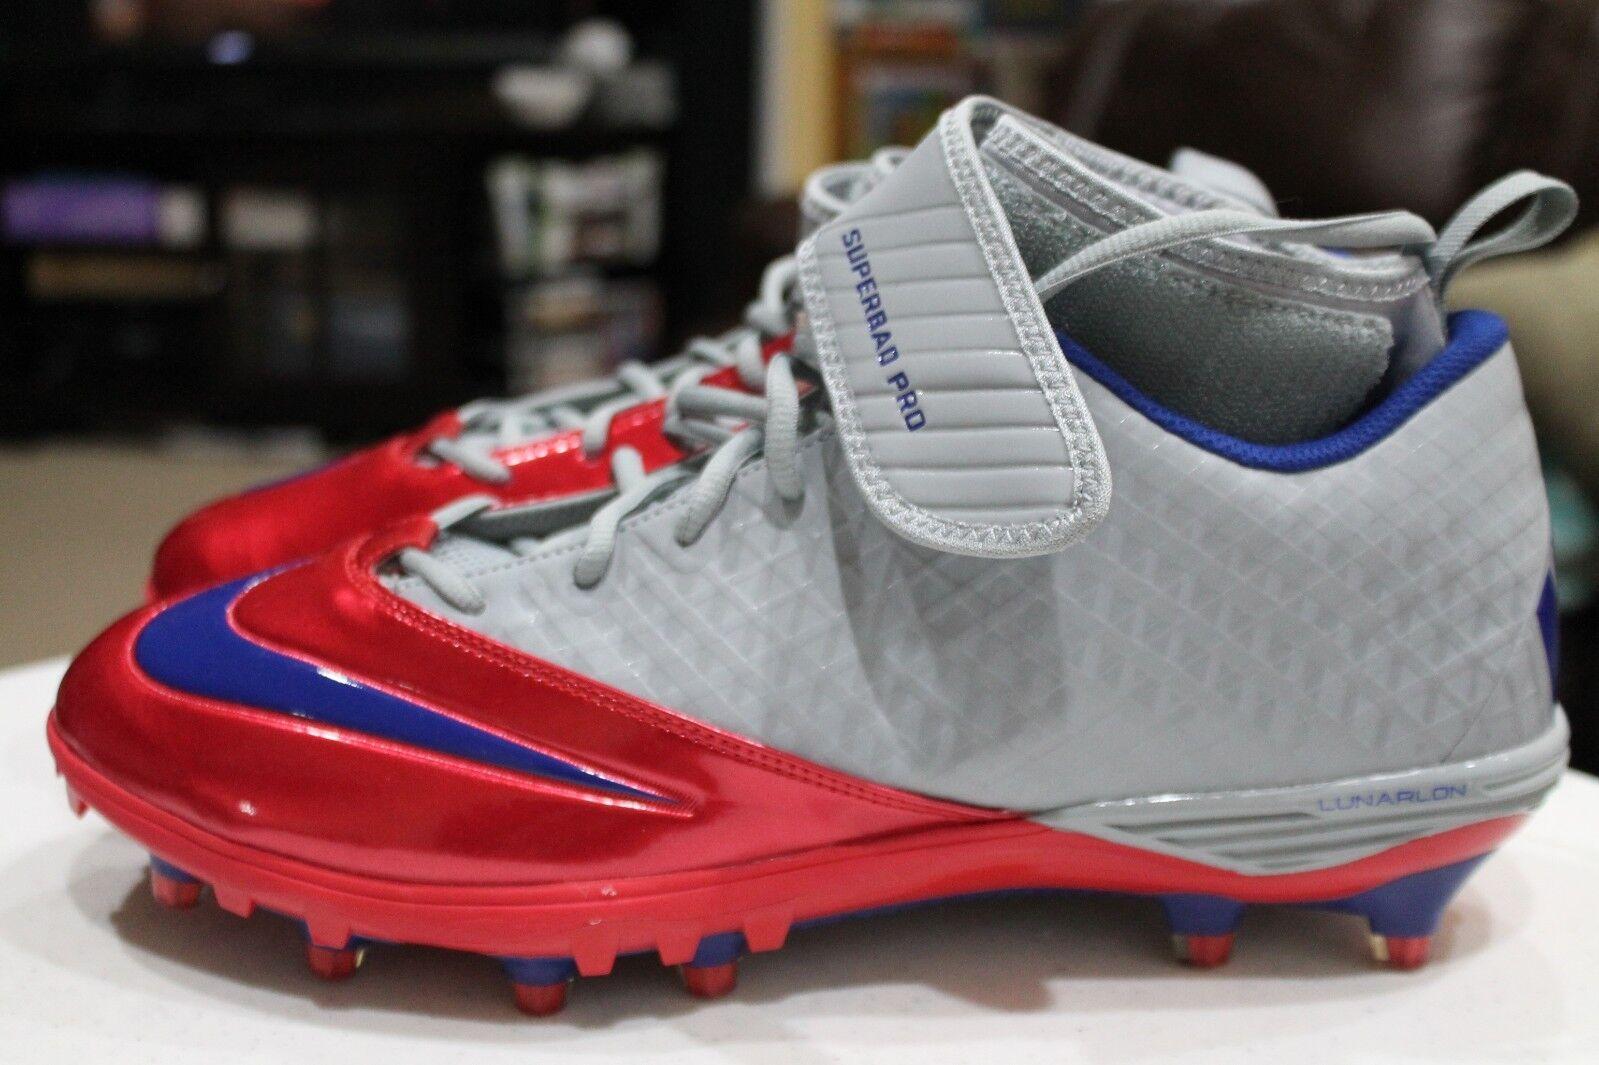 NEW Nike Superbad Pro Lunarlon--size 14, gray, red, blue--534994-046